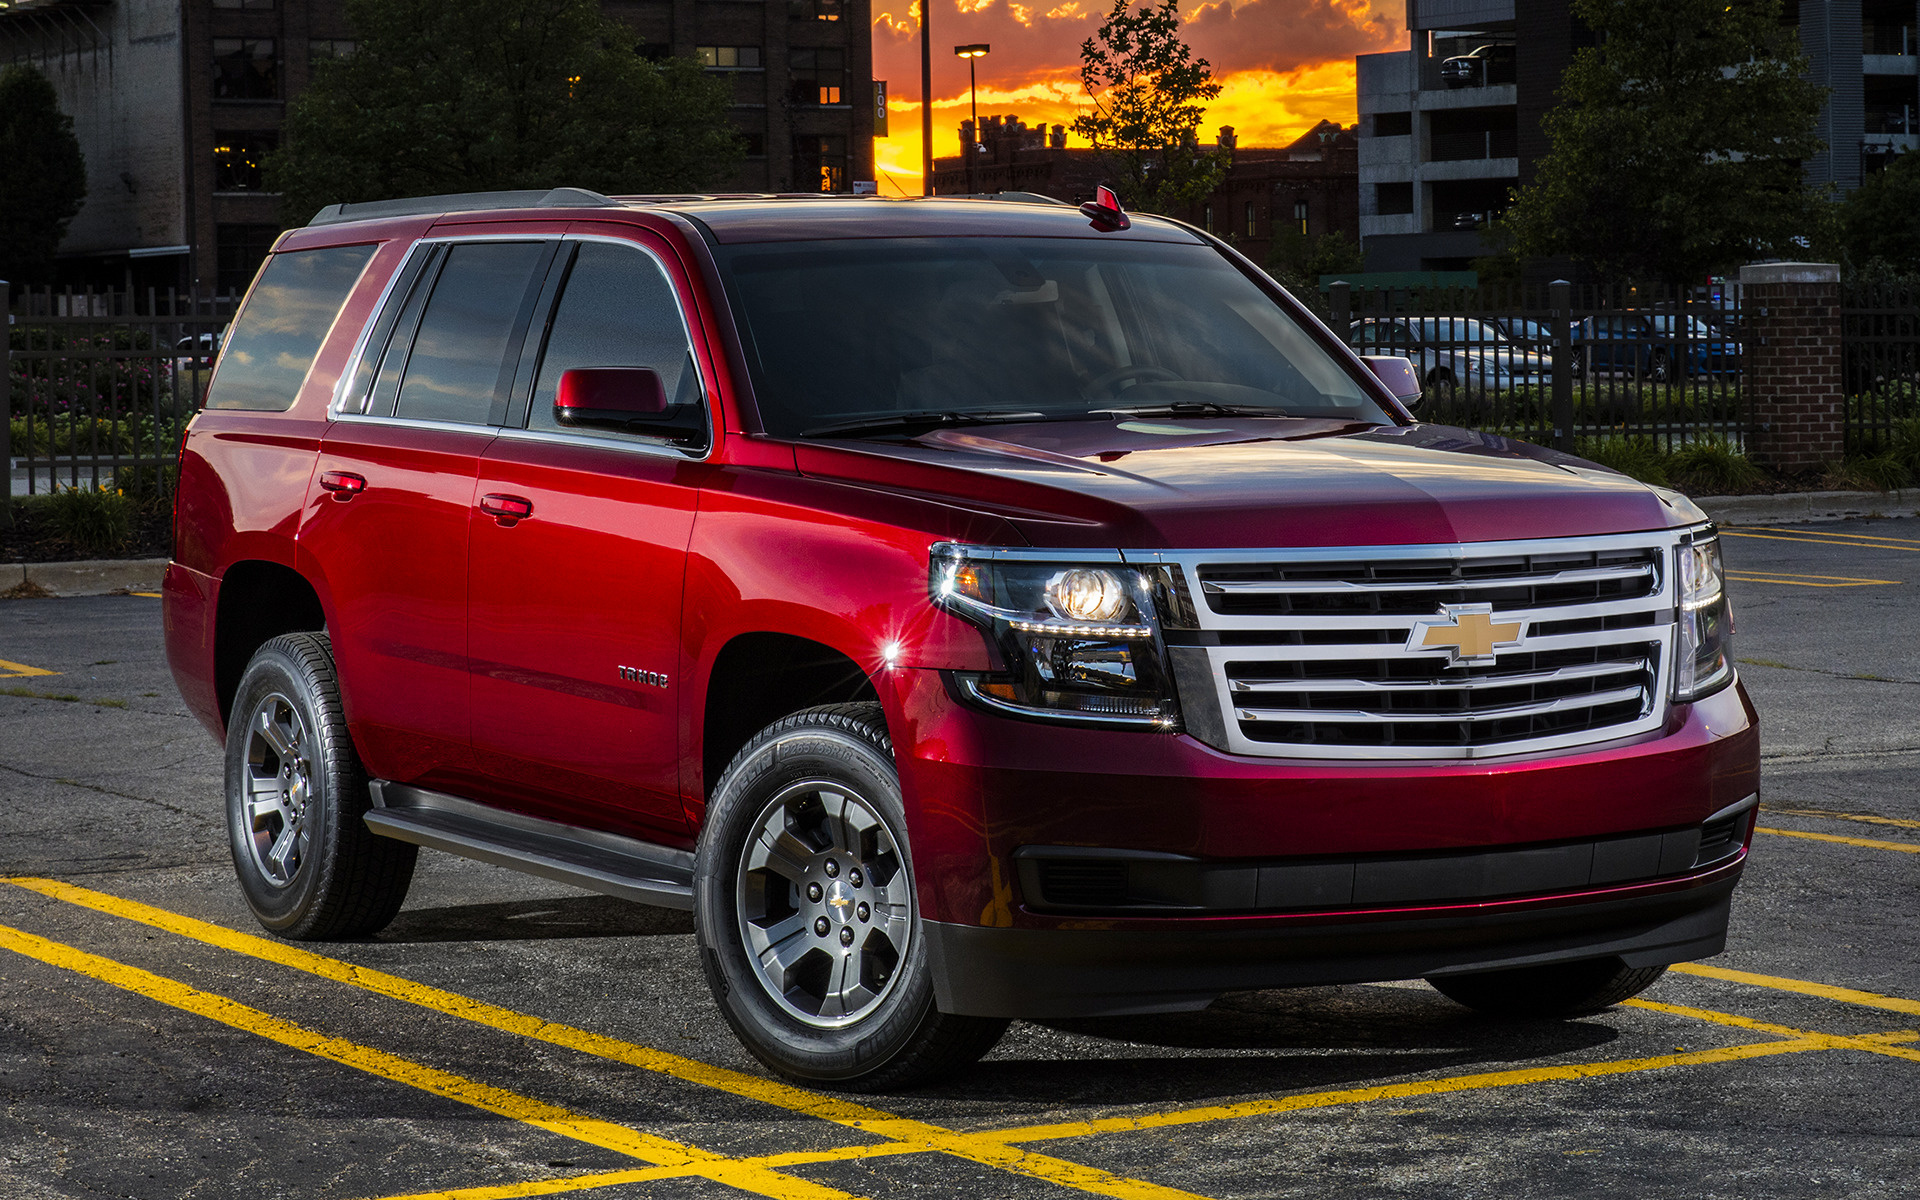 Image result for Chevrolet Tahoe wallpaper